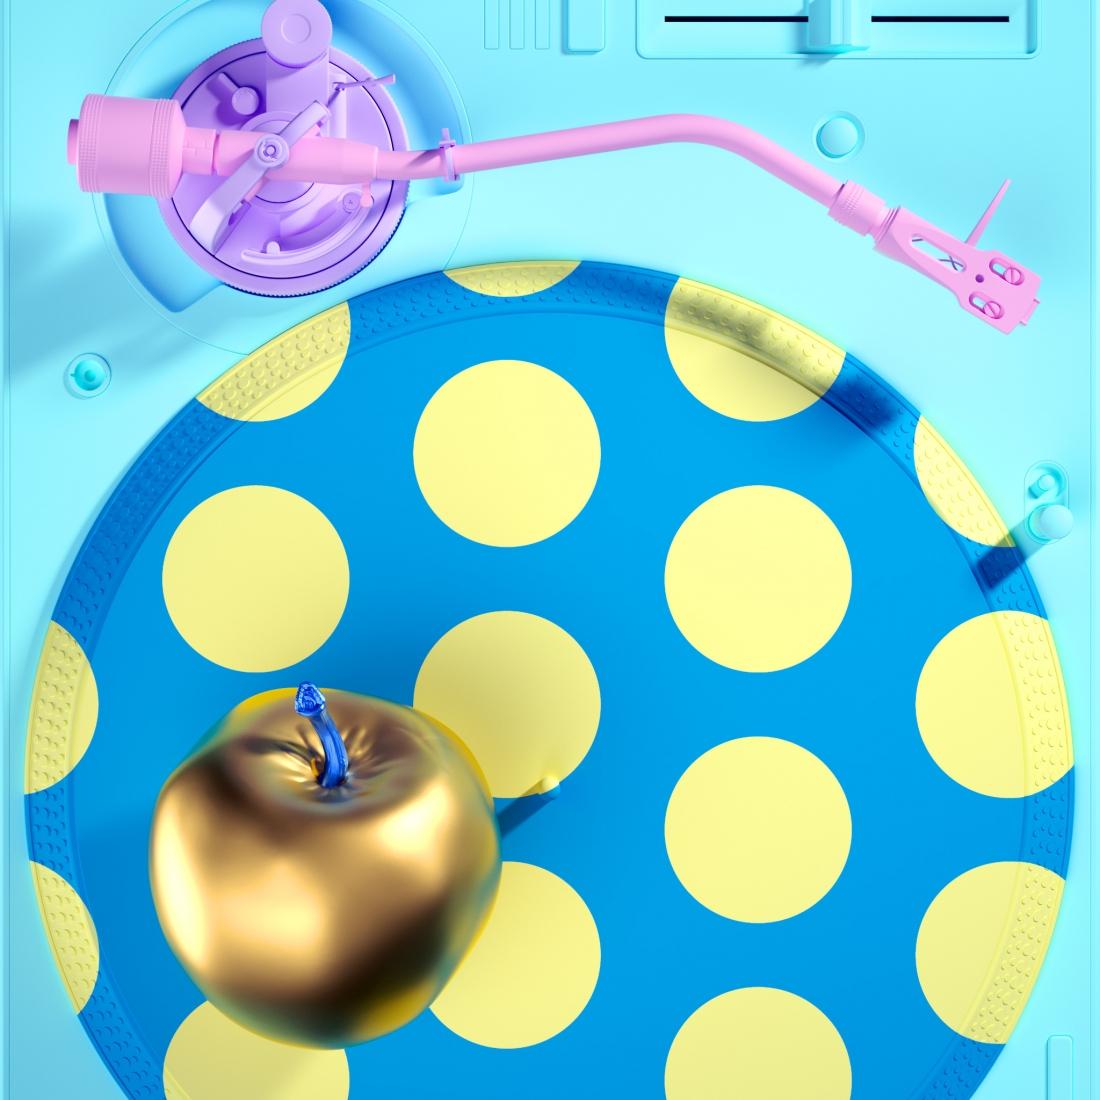 Bright, bold and crazy digital pop art by Kota Yamaji with